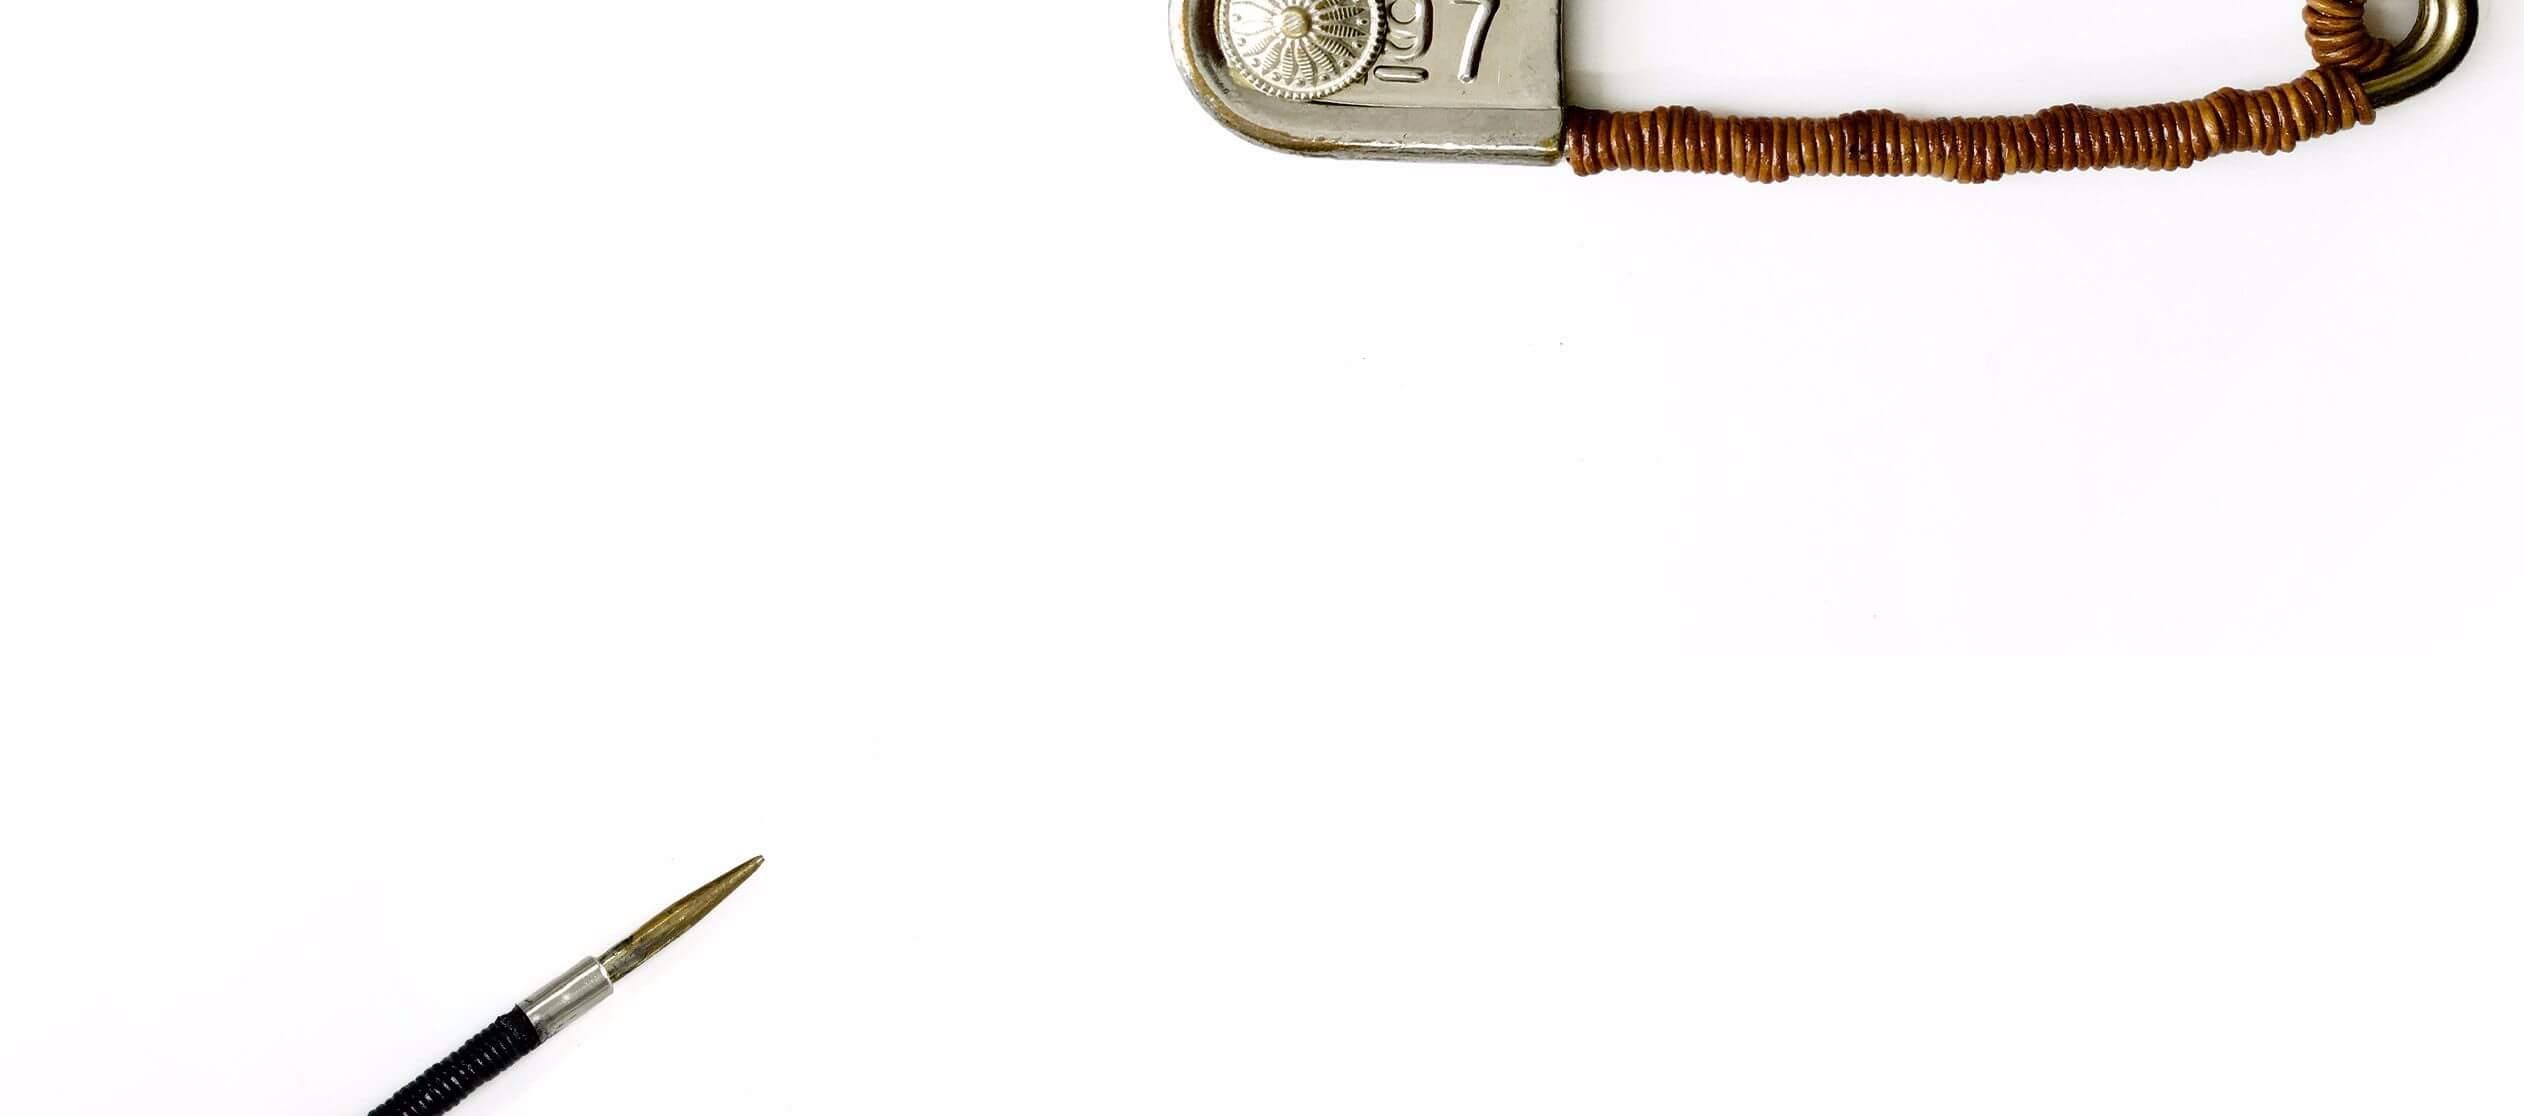 ASCARI BICYCLES - ASCARI PINS by OLD JOE